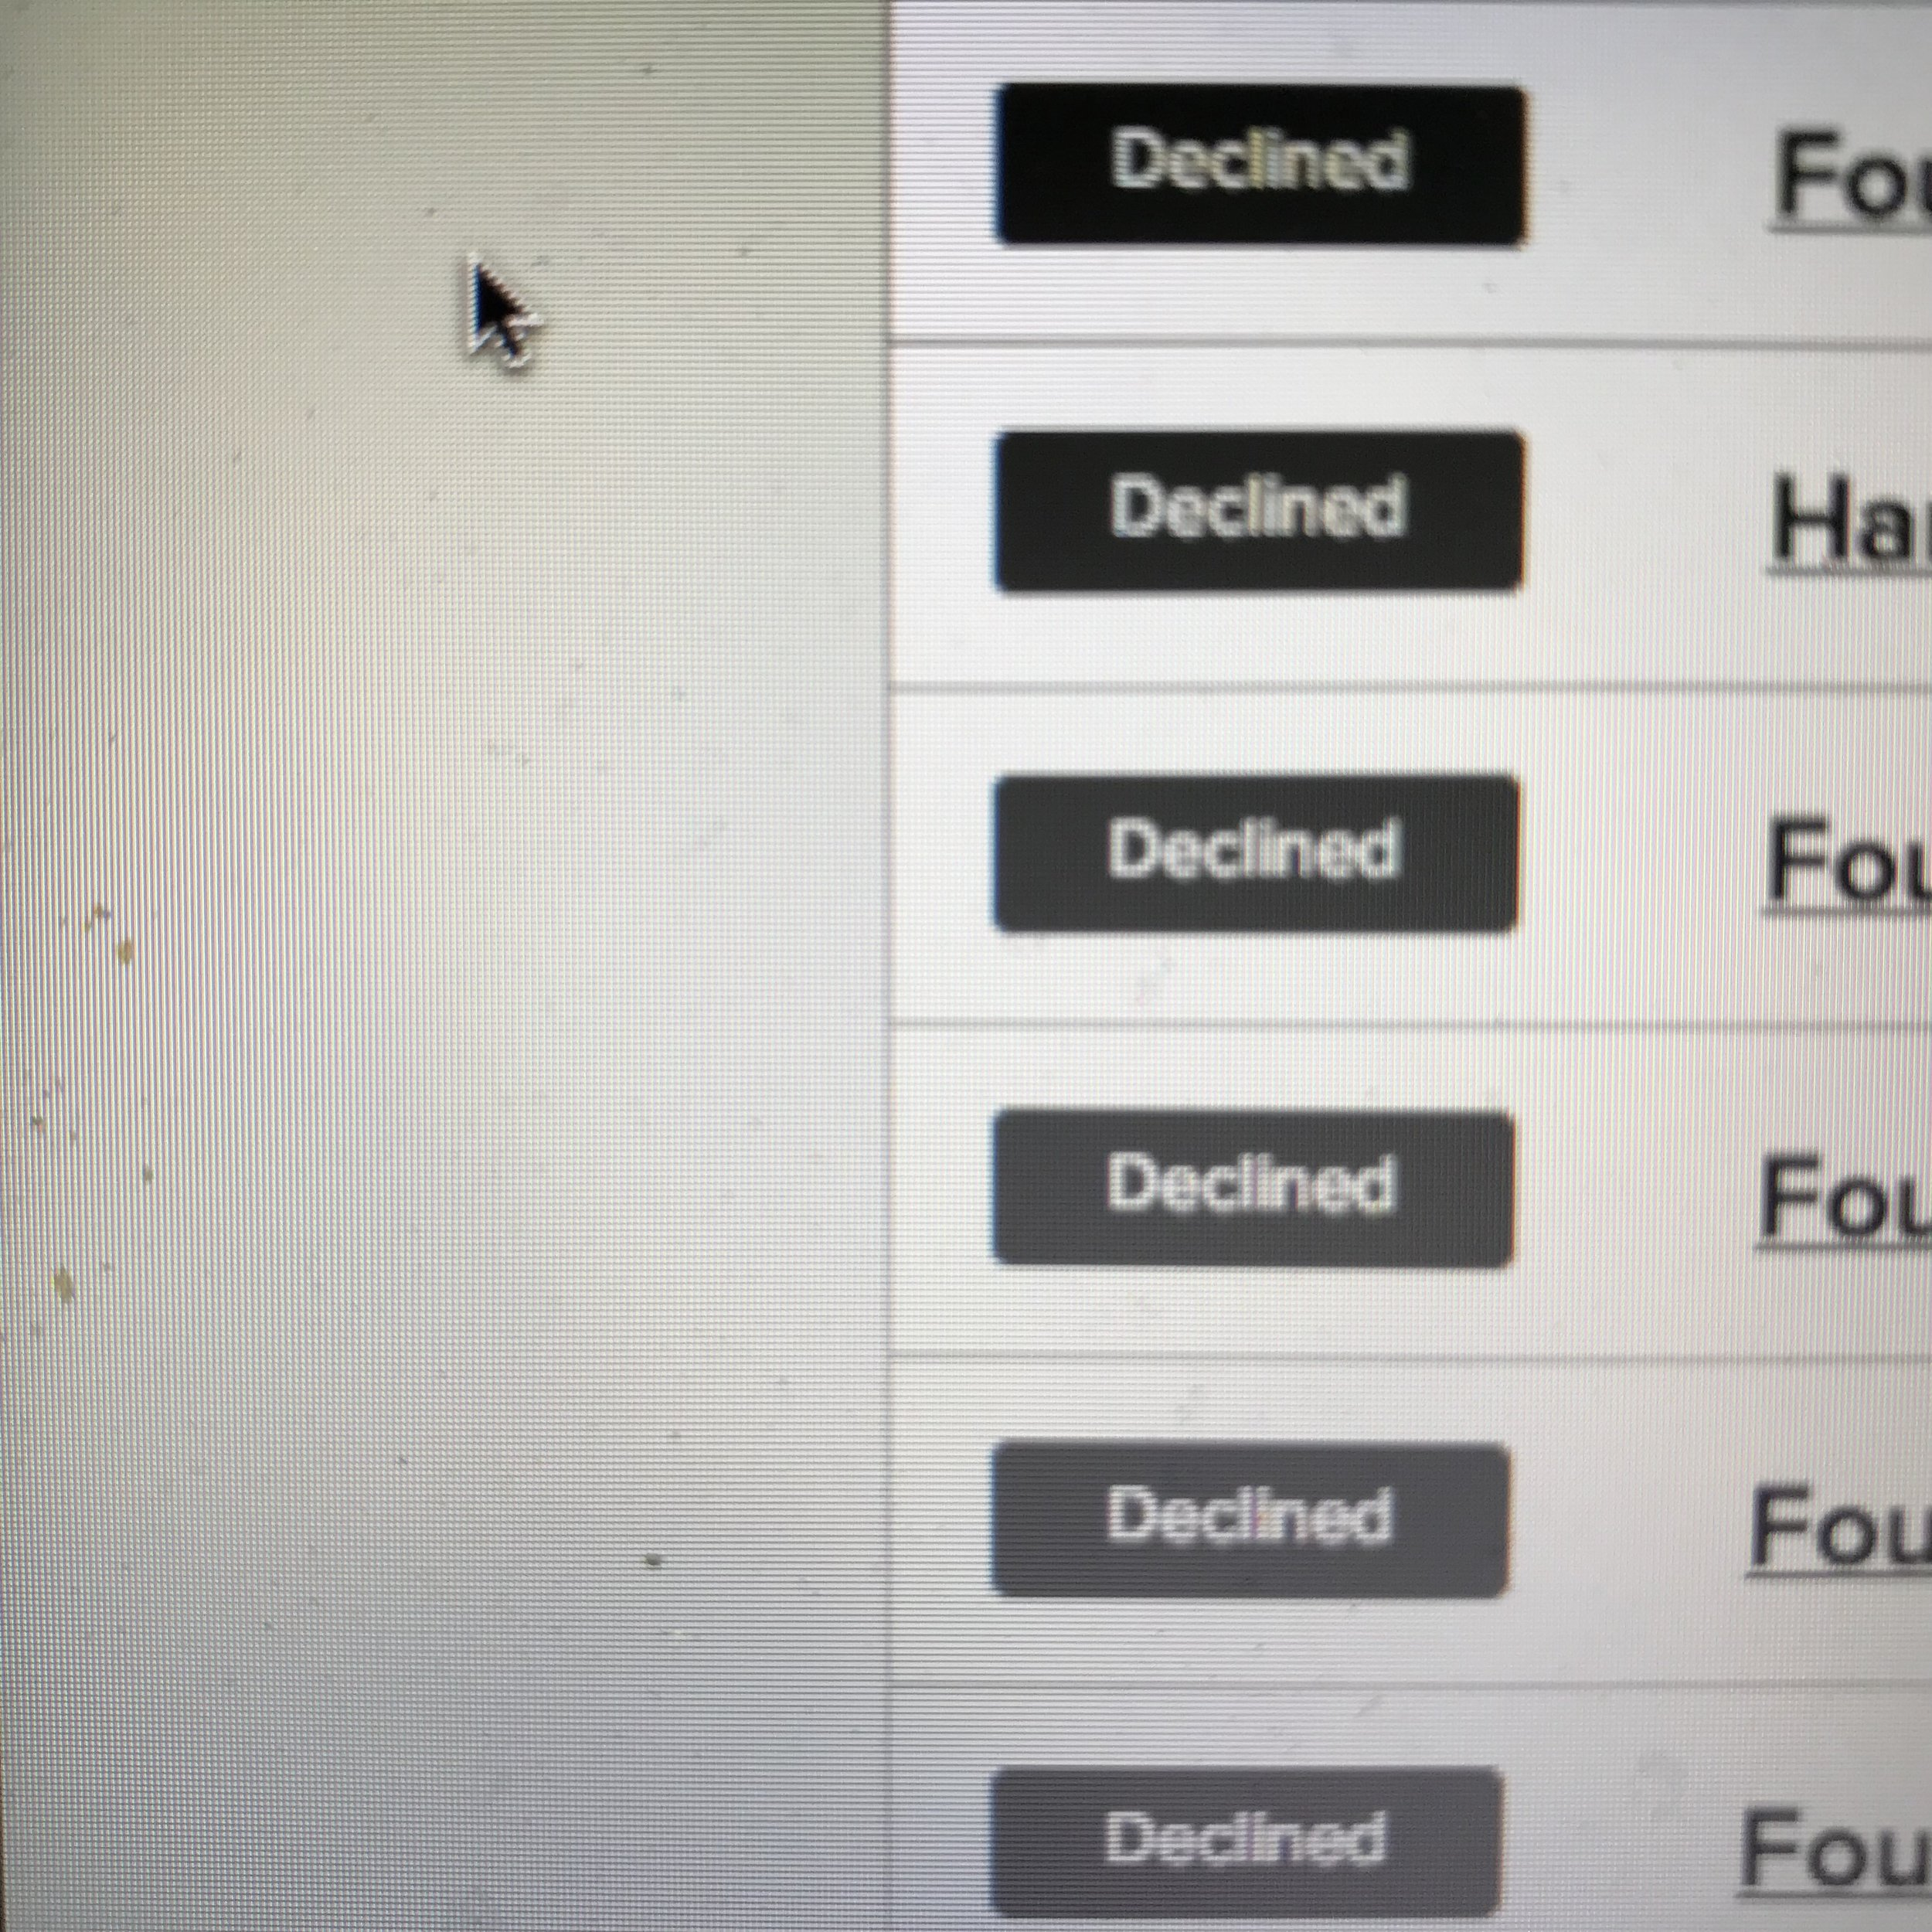 declined.jpg